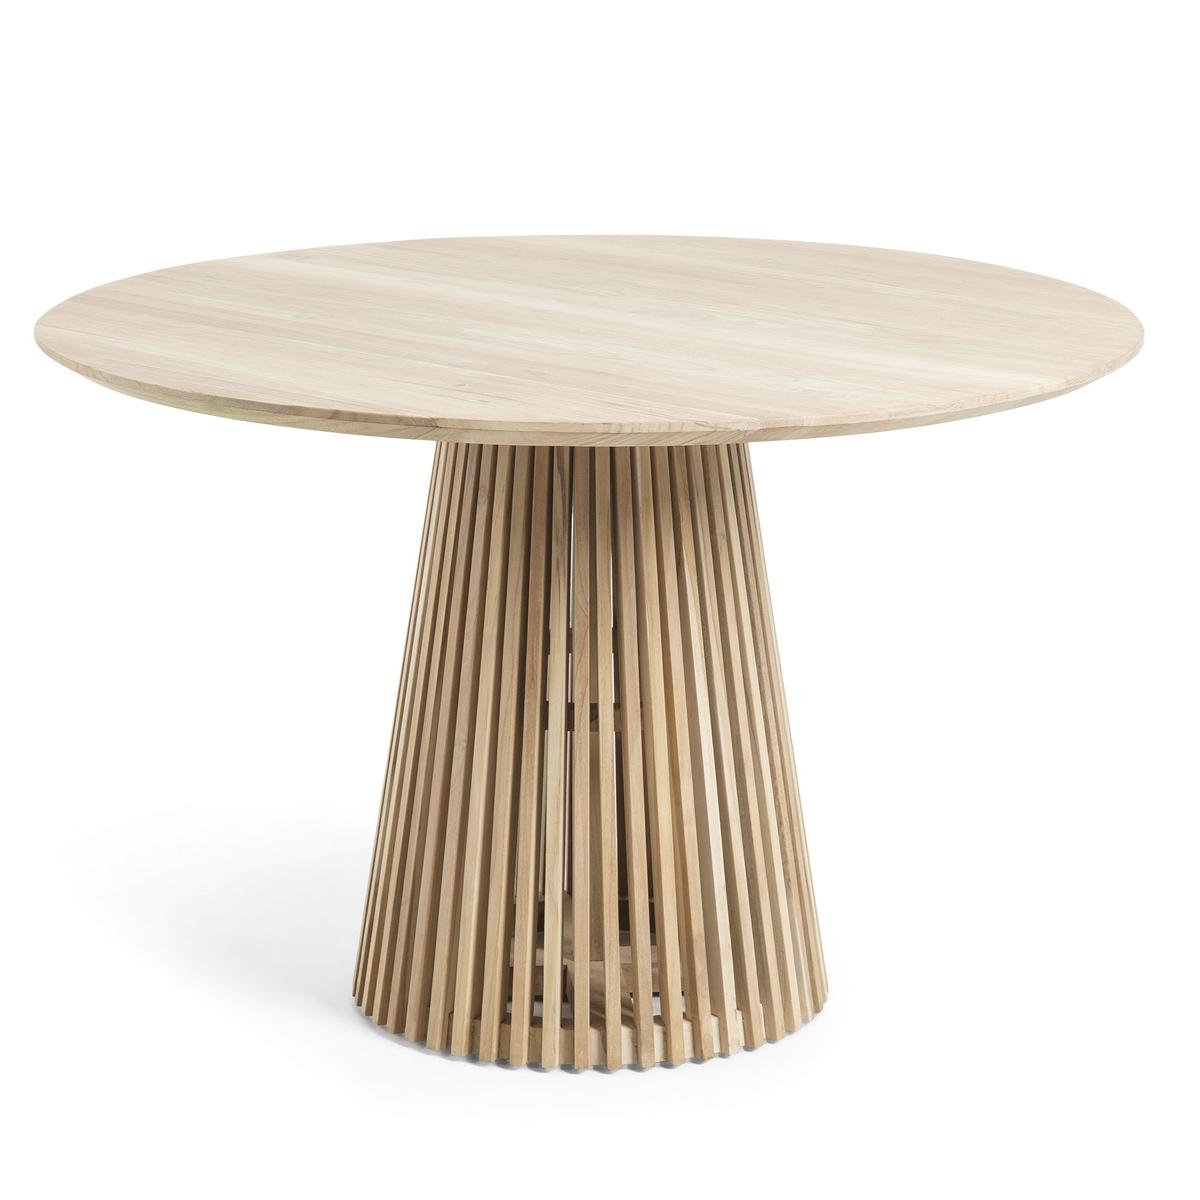 Table ronde en teck - Naturel - H 78 x Ø 120 cm